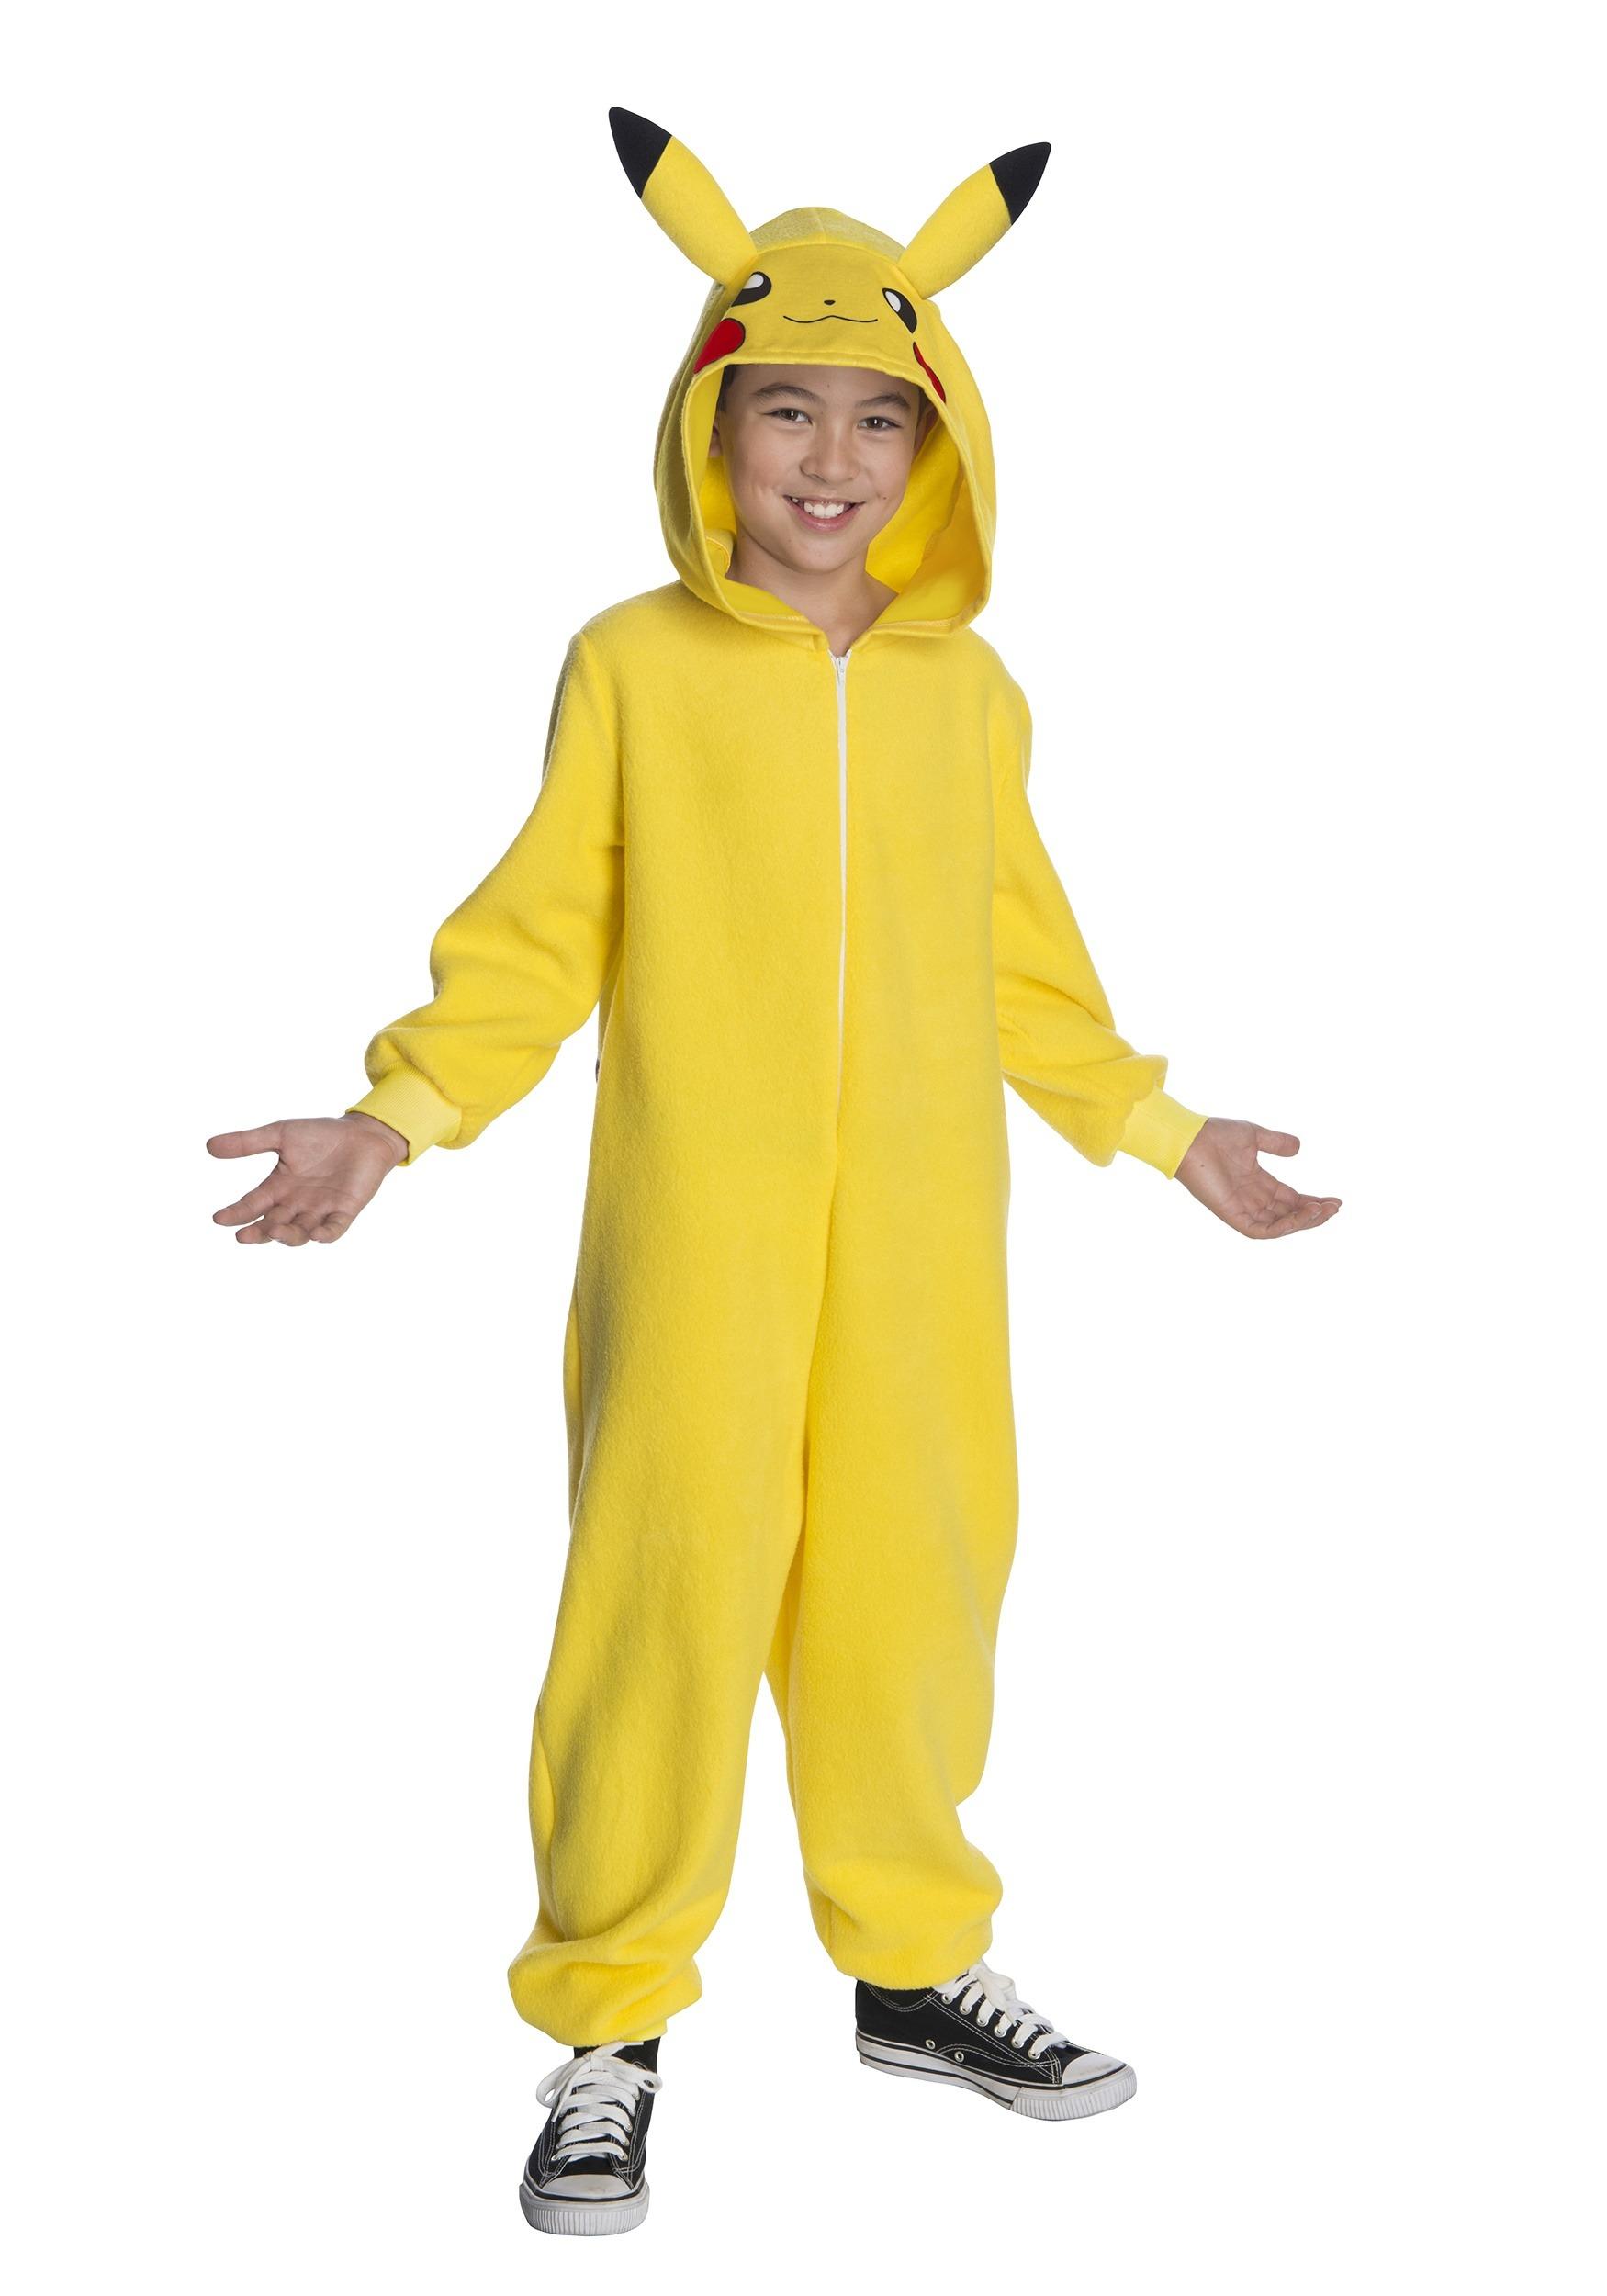 c6e4f64aae62 Pokemon Pikachu Kid s Costume